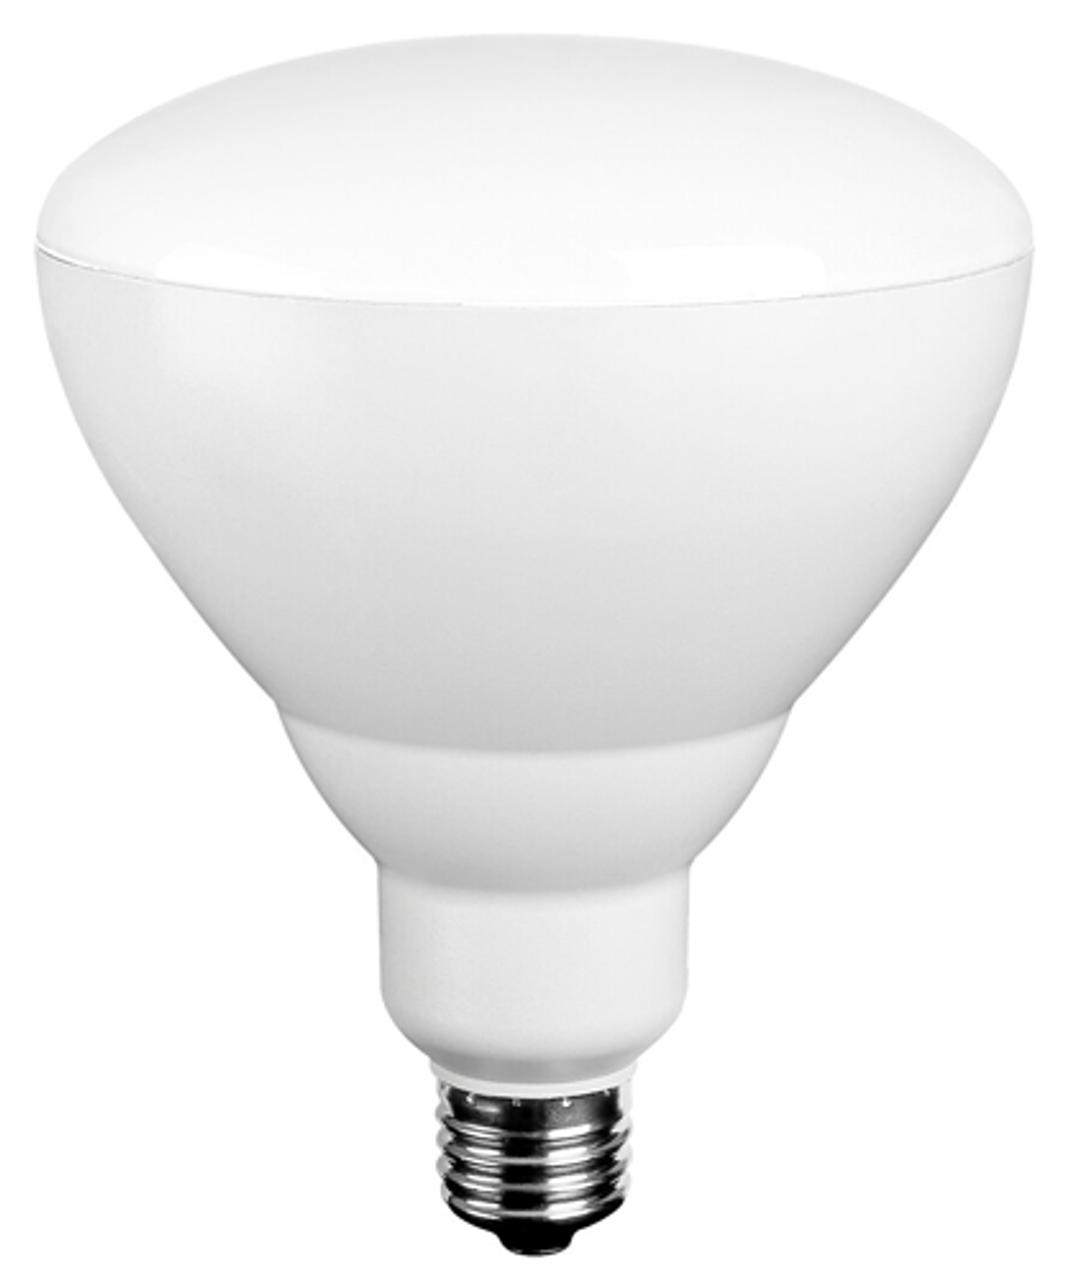 BR40 LED Bulb, 15 Watt, 1200 Lumens, 3000K